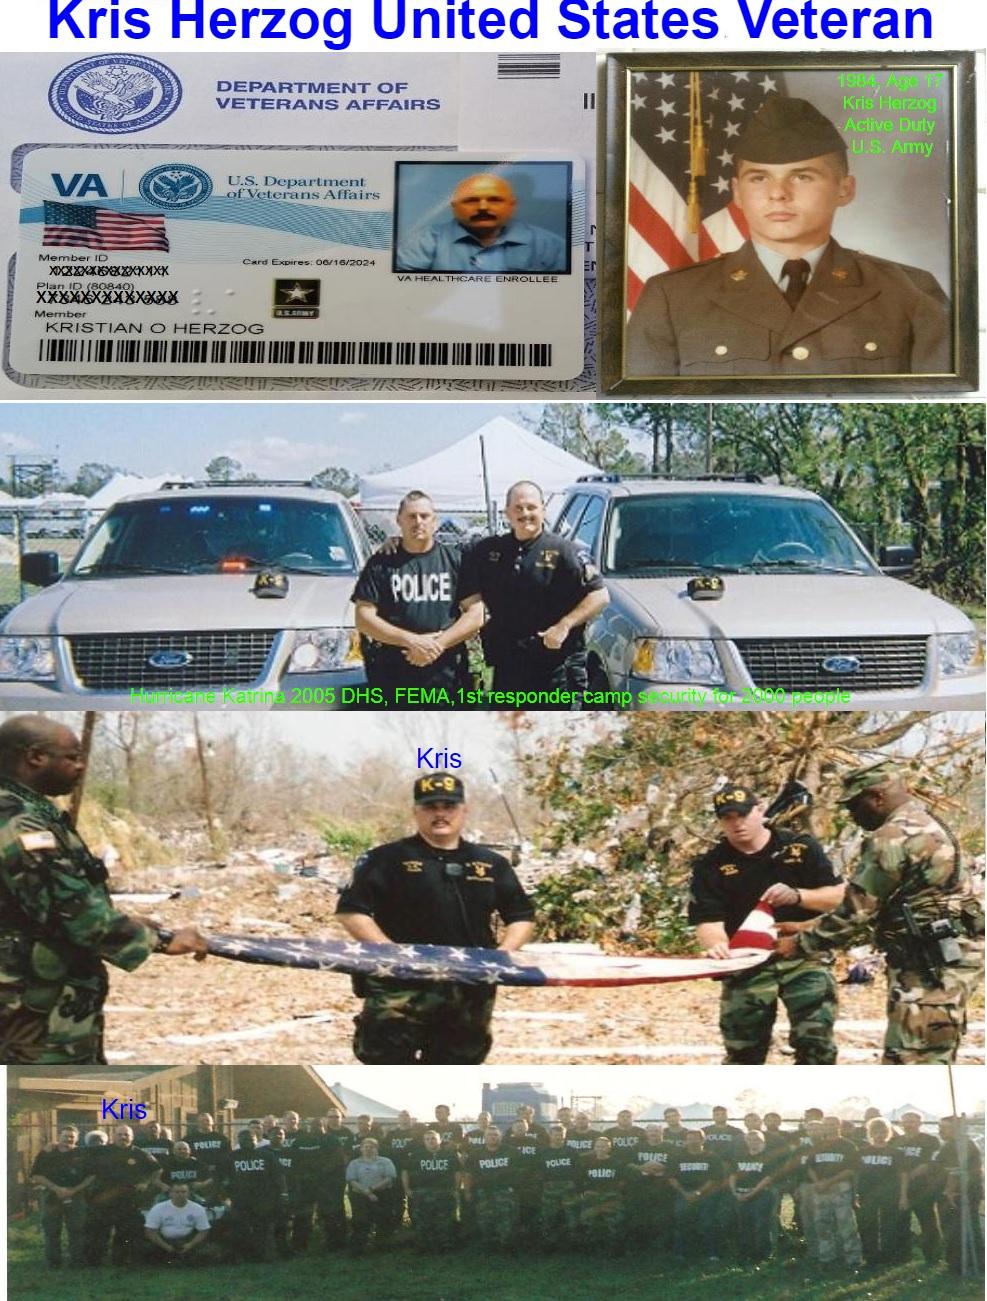 Kris Herzog, famous celebrity bodyguard Kris Herzog U.S. Veteran